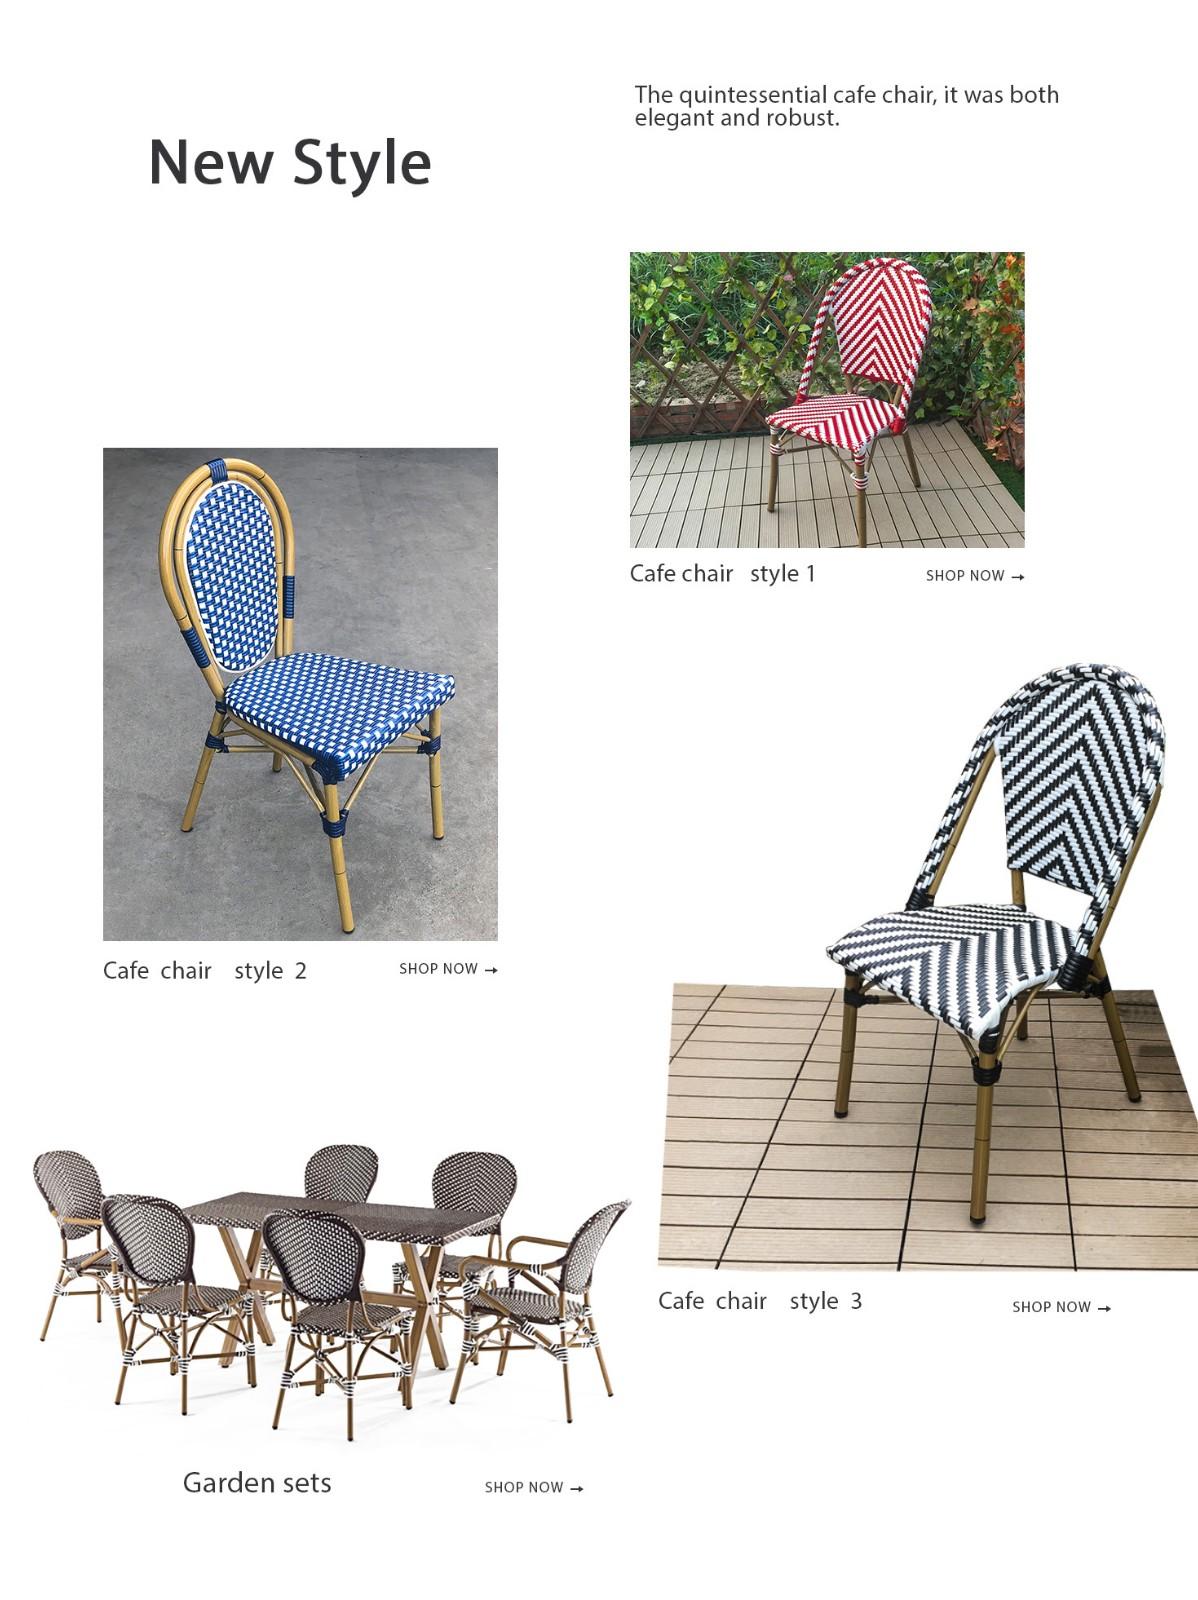 Uptop Furnishings-Oem Chair Furniture Manufacturer, Restaurant Chairs | Uptop Furnishings-6